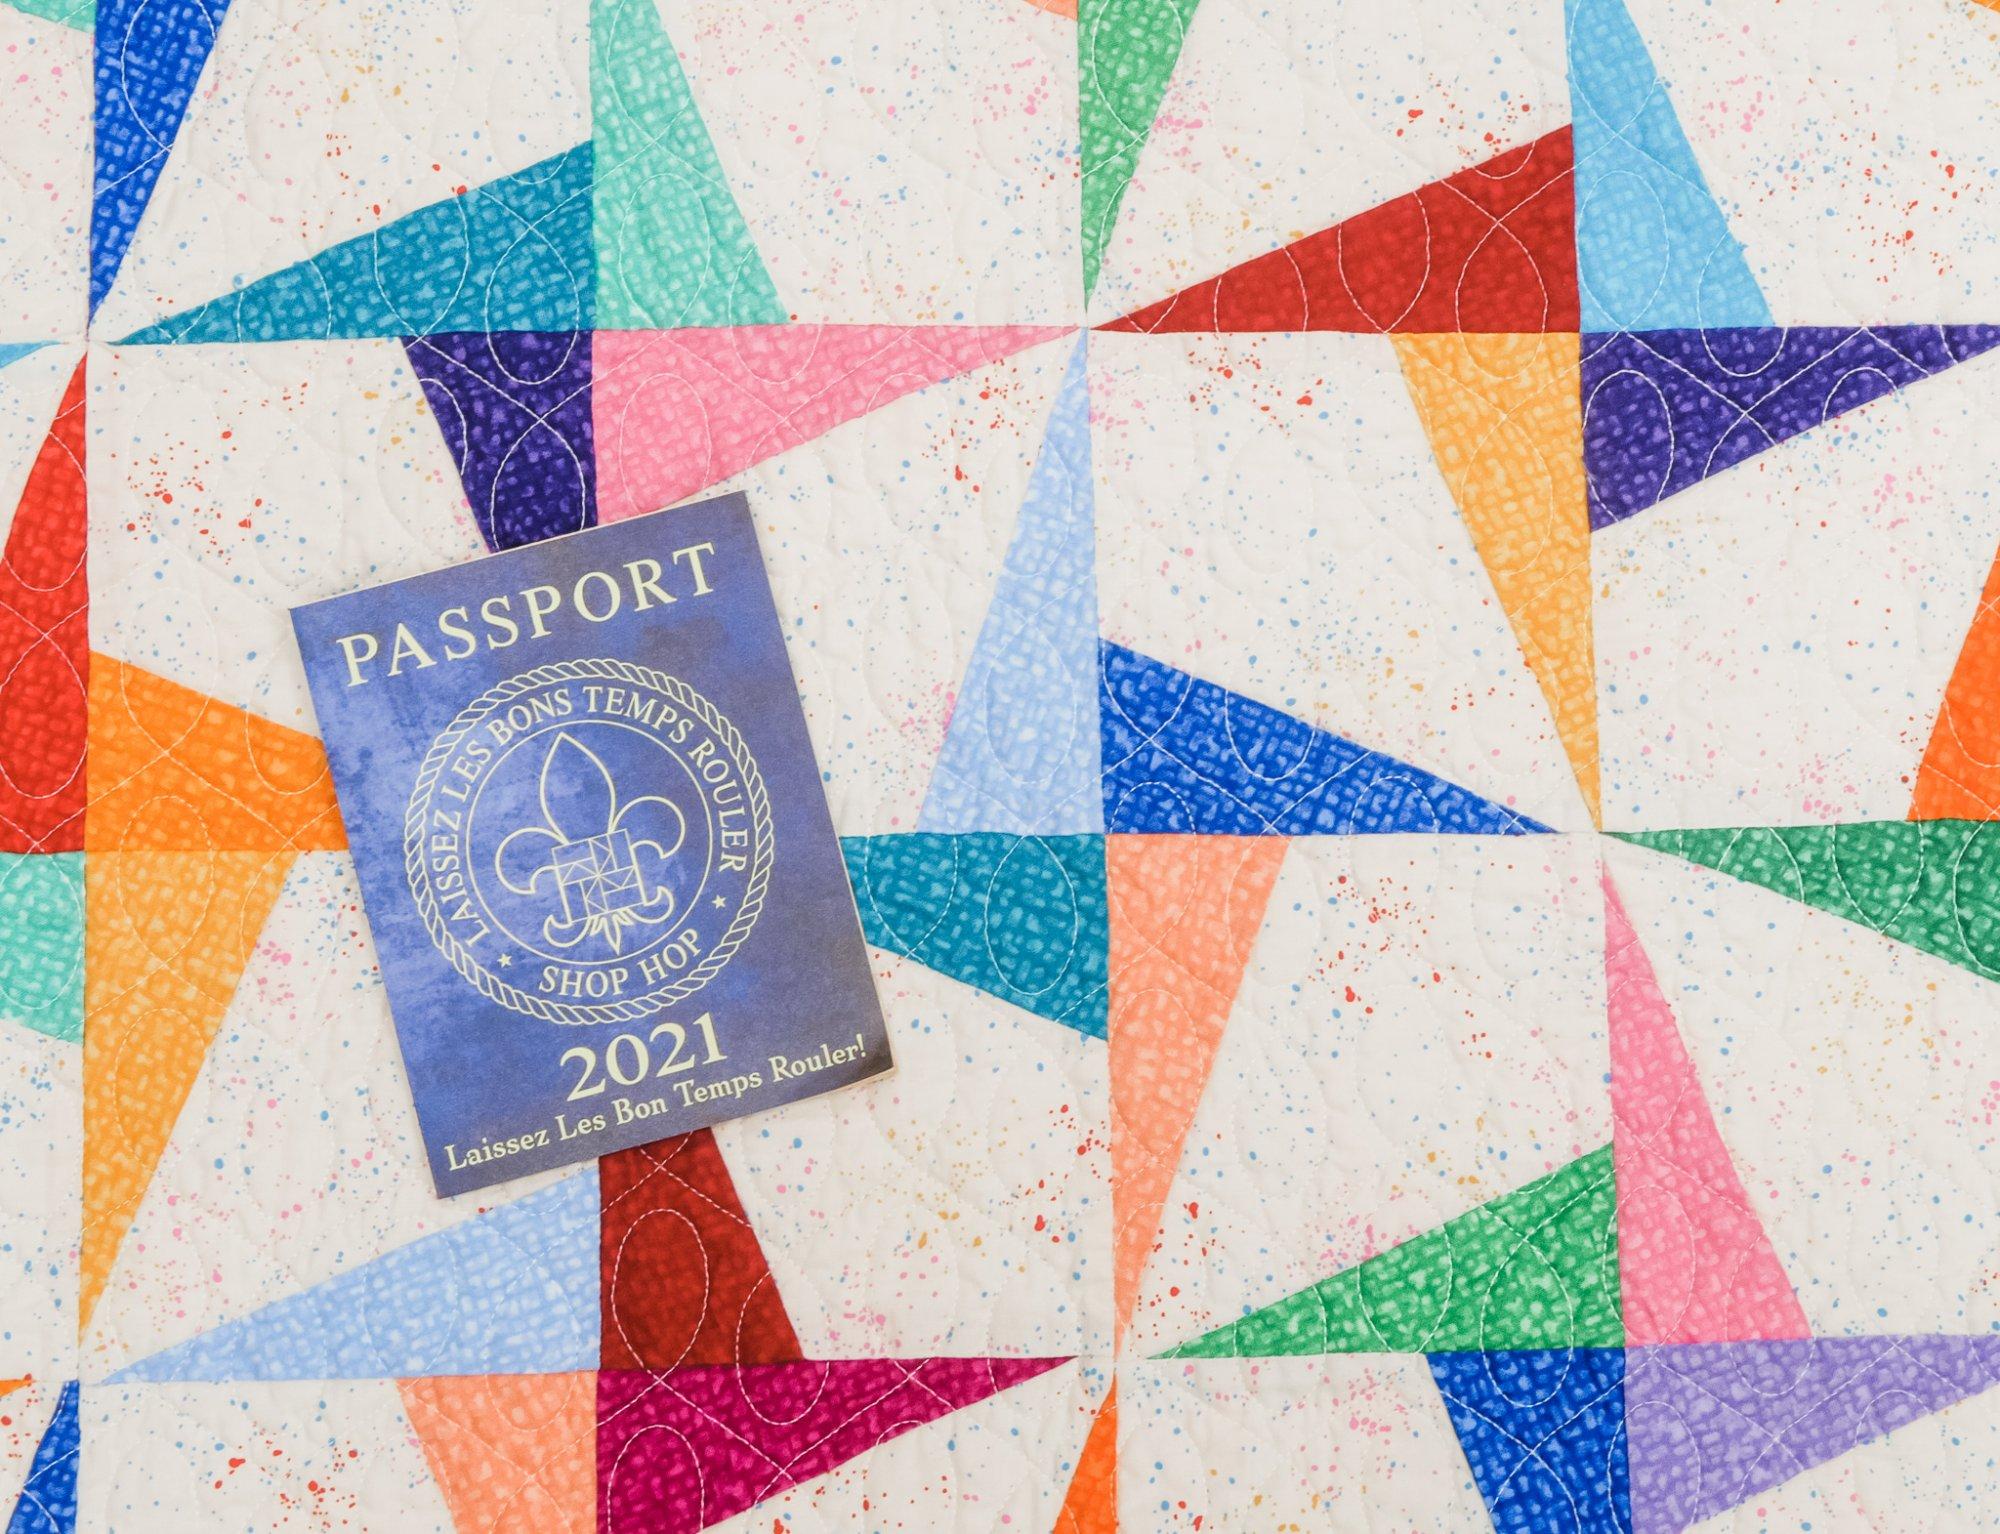 Passport - Shop Hop 2021